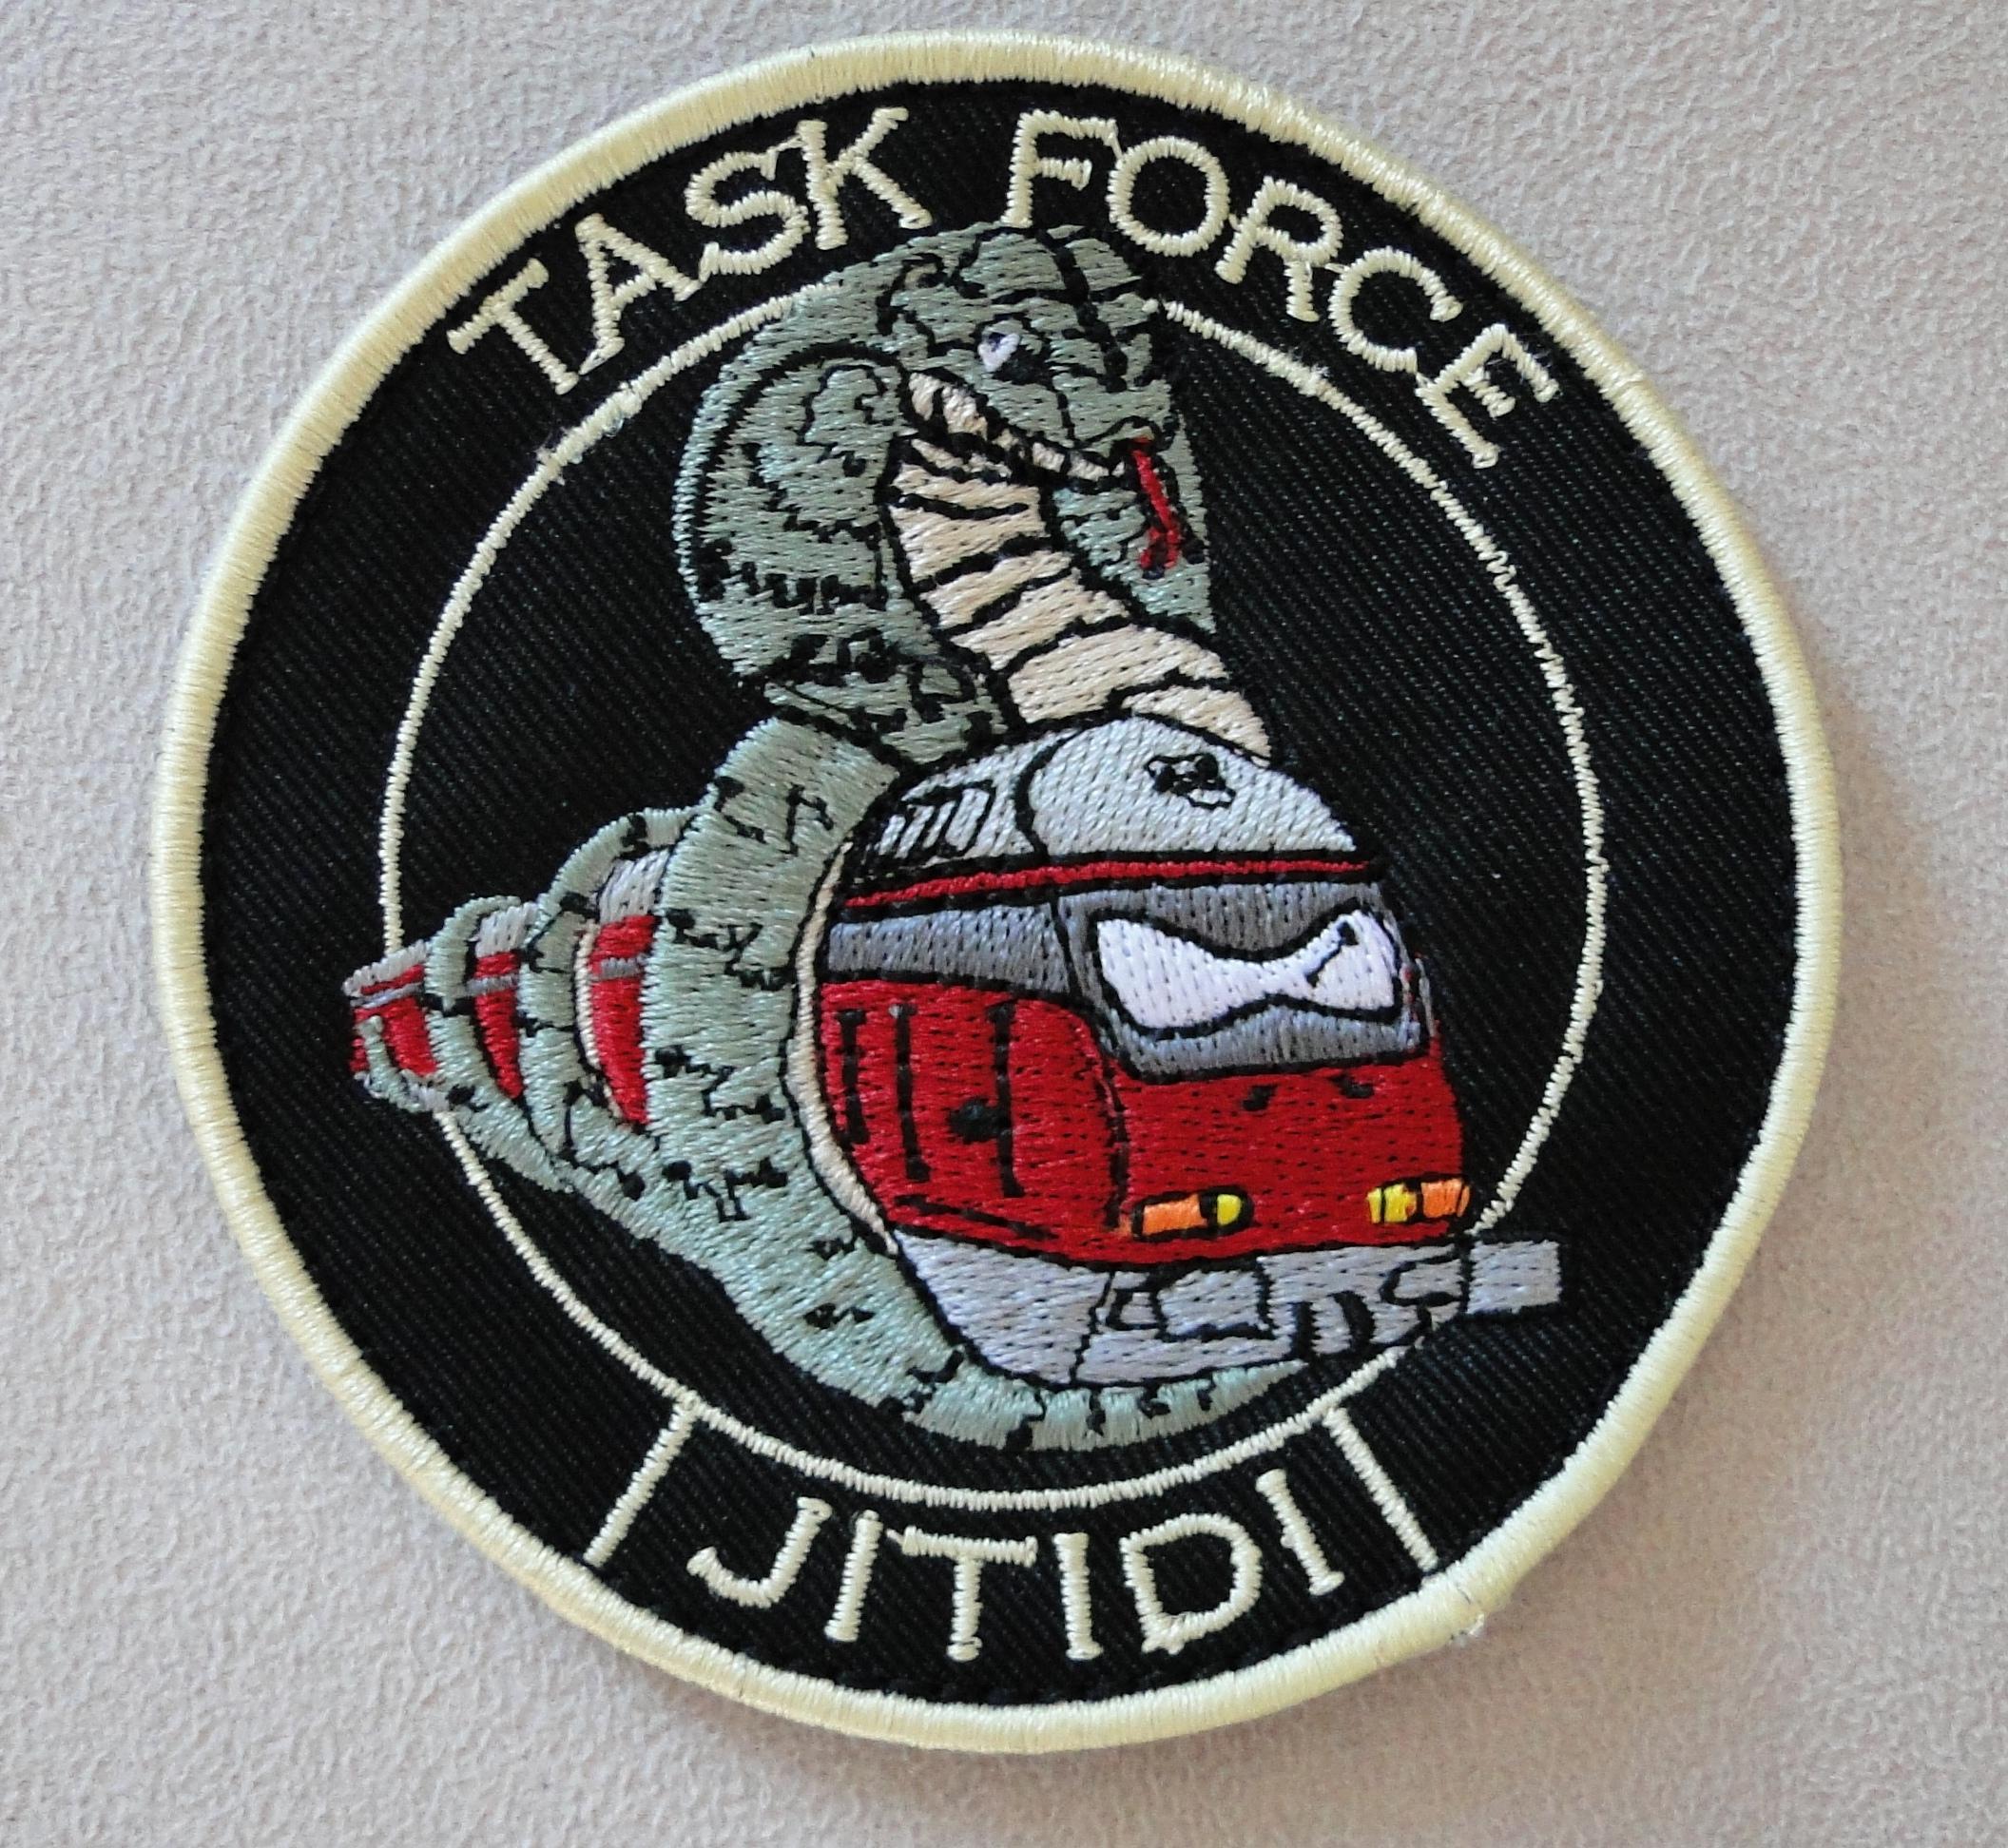 Task Force - JTIDI